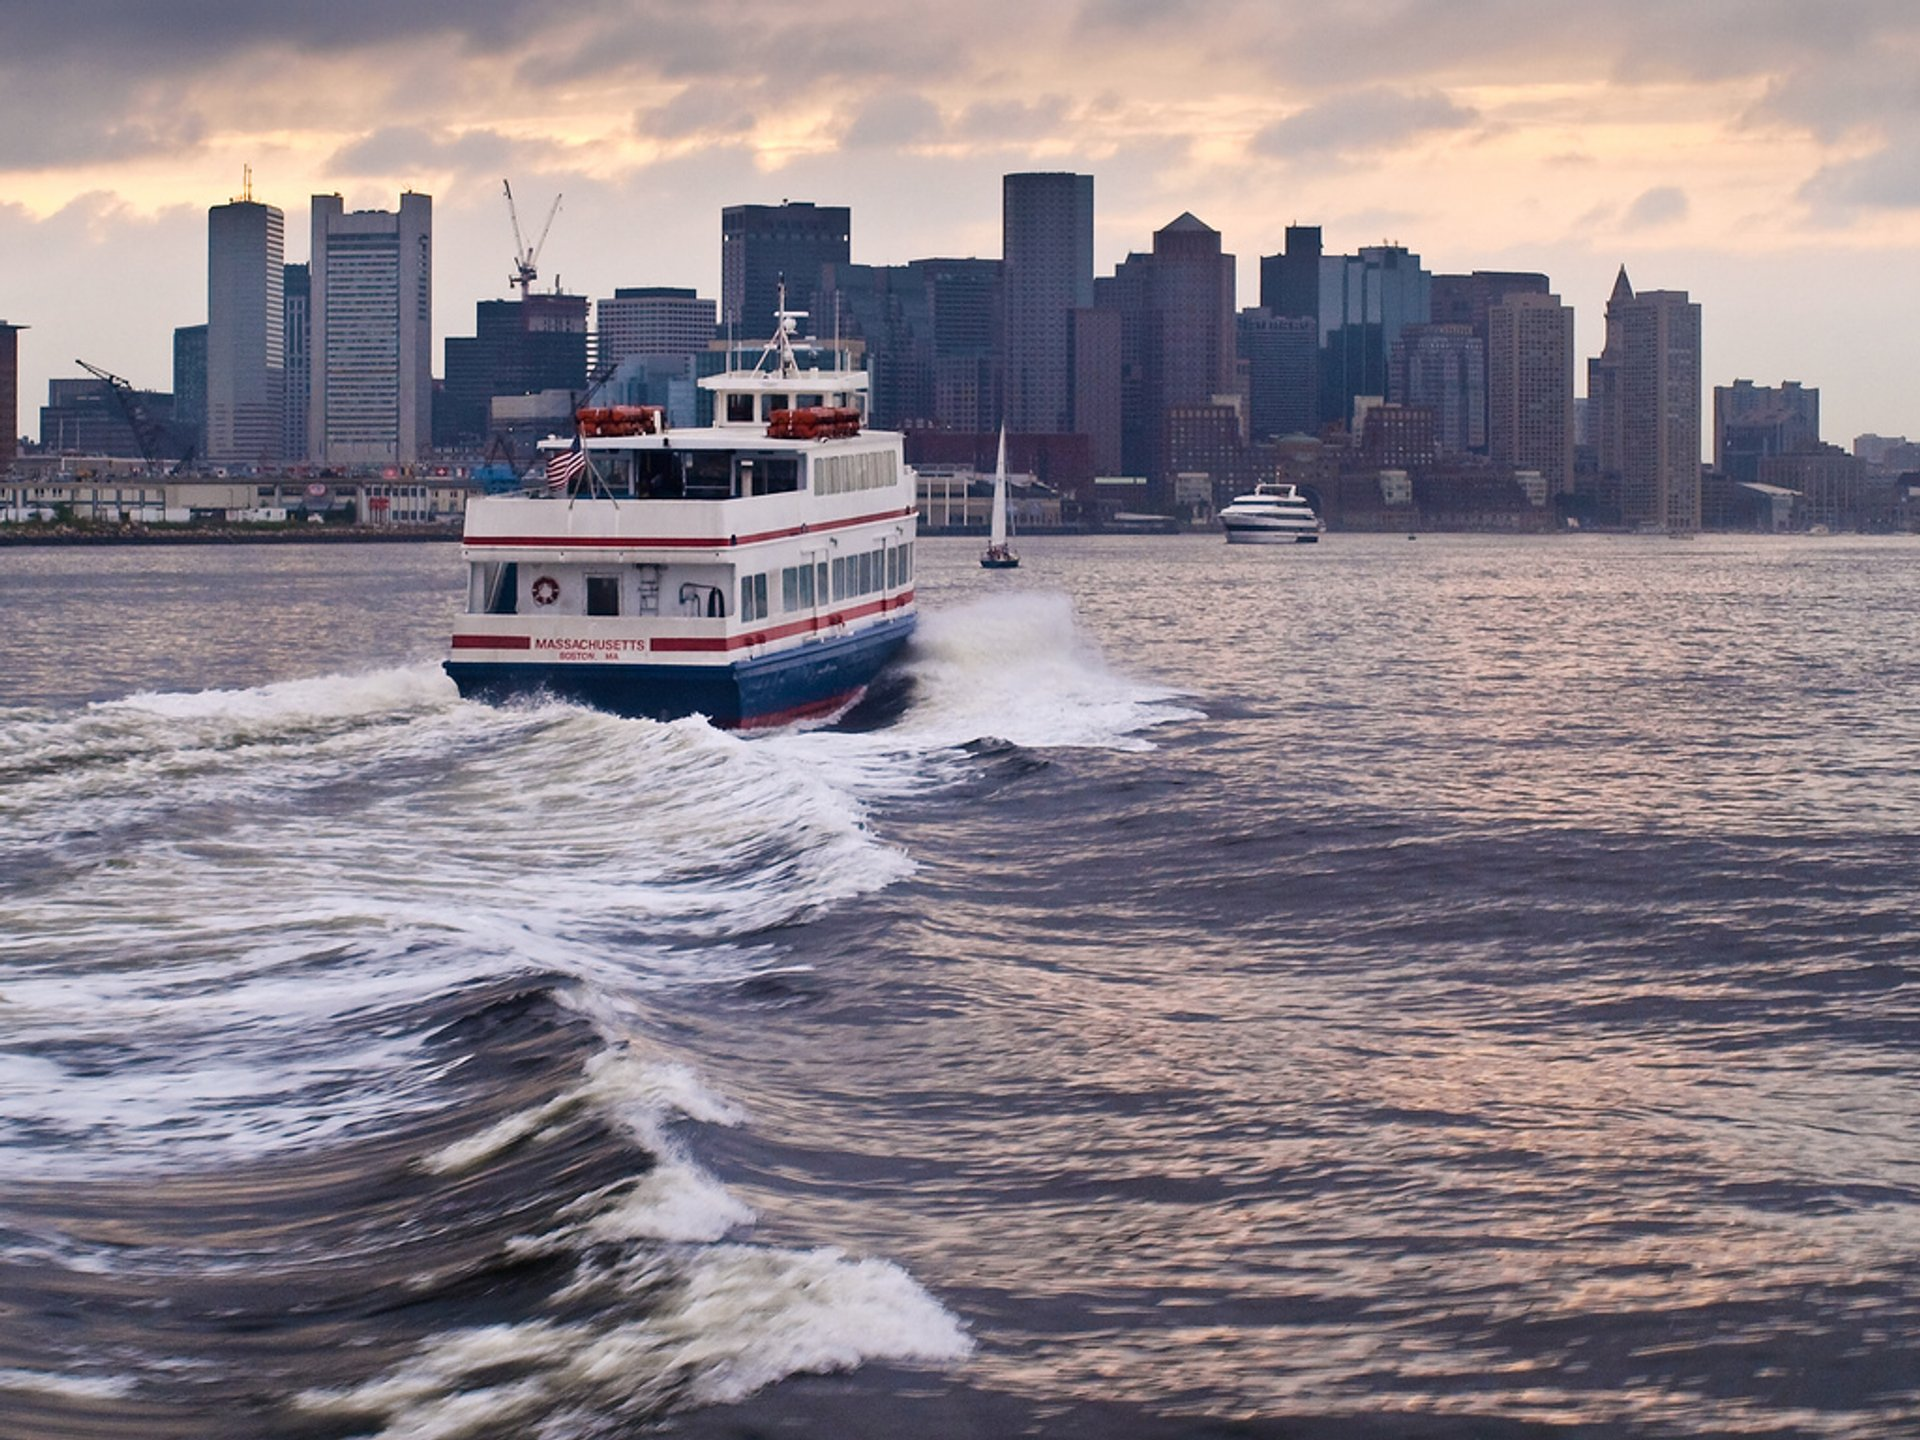 Boston Harbor Cruises in Boston 2019 - Best Time